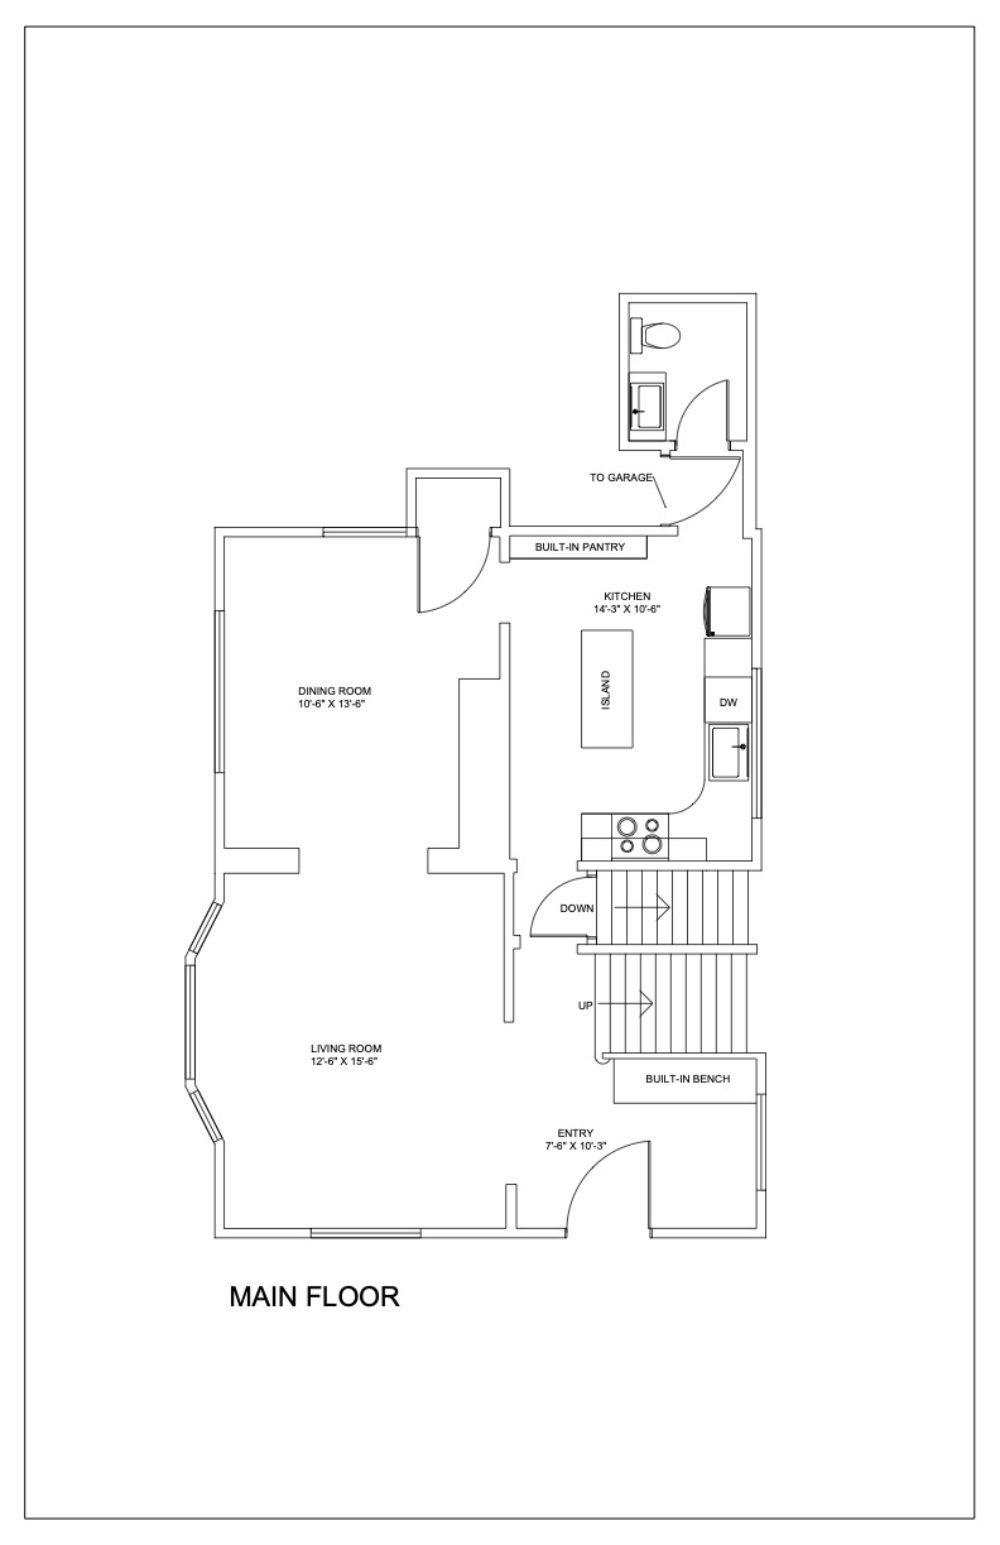 210815 712 Initiative Housing Revitalization 710 Bluff Street Main Floor copy